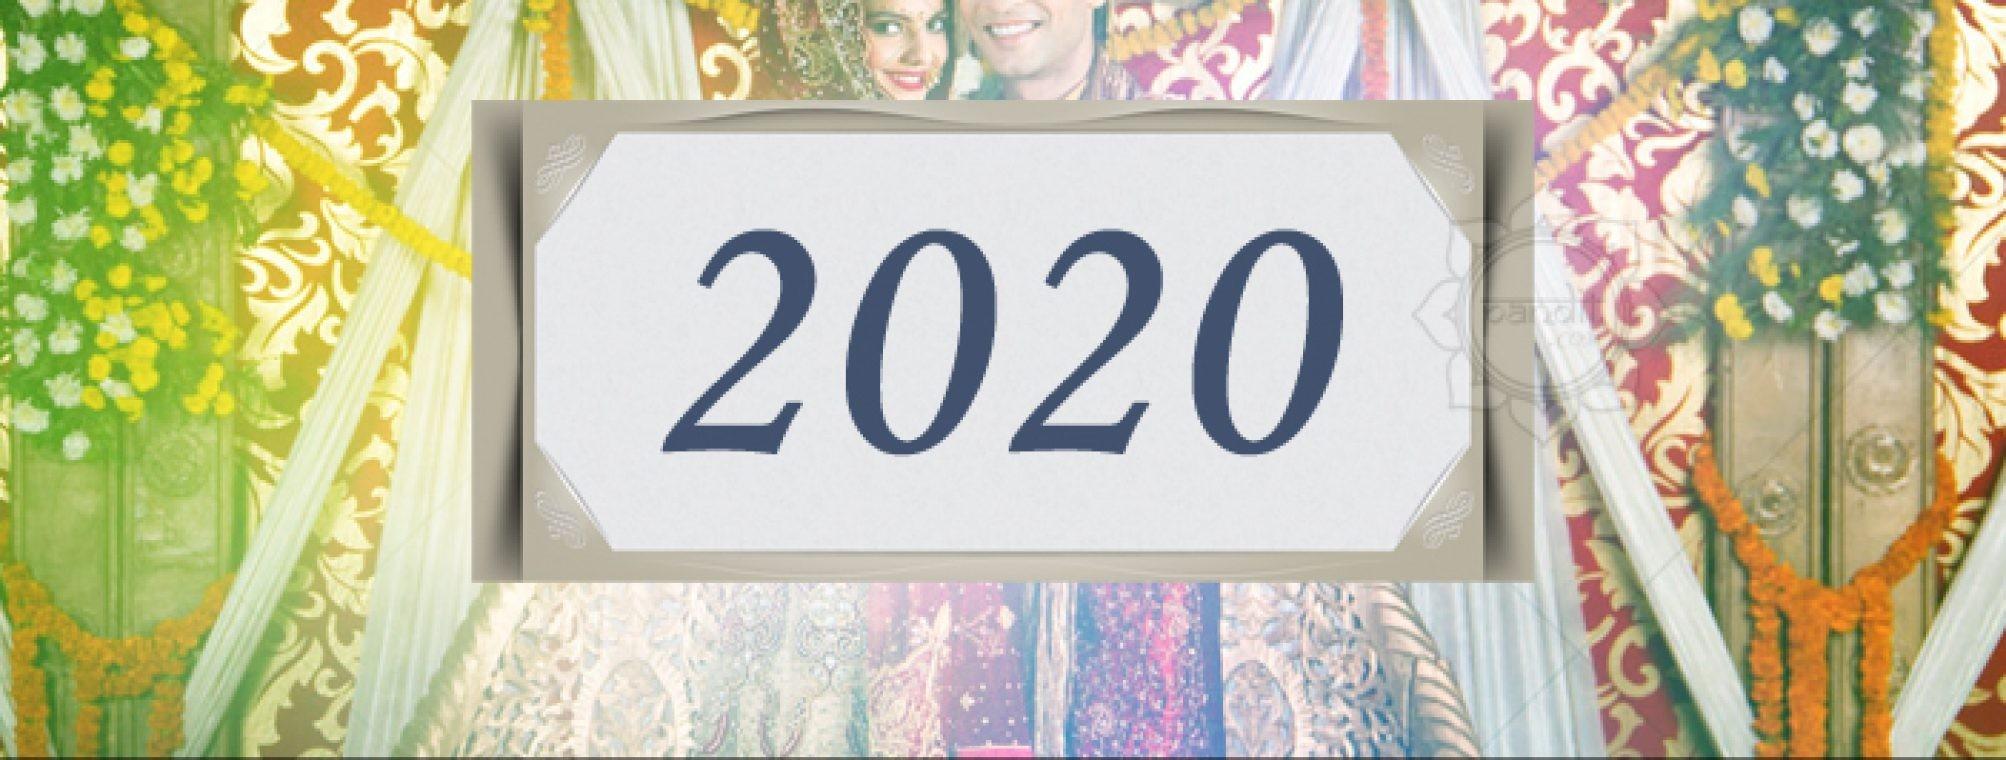 Shubh Muhurat For Marriage Ceremony 2020 - Pandit-January 2020 Calendar Vivah Muhurat